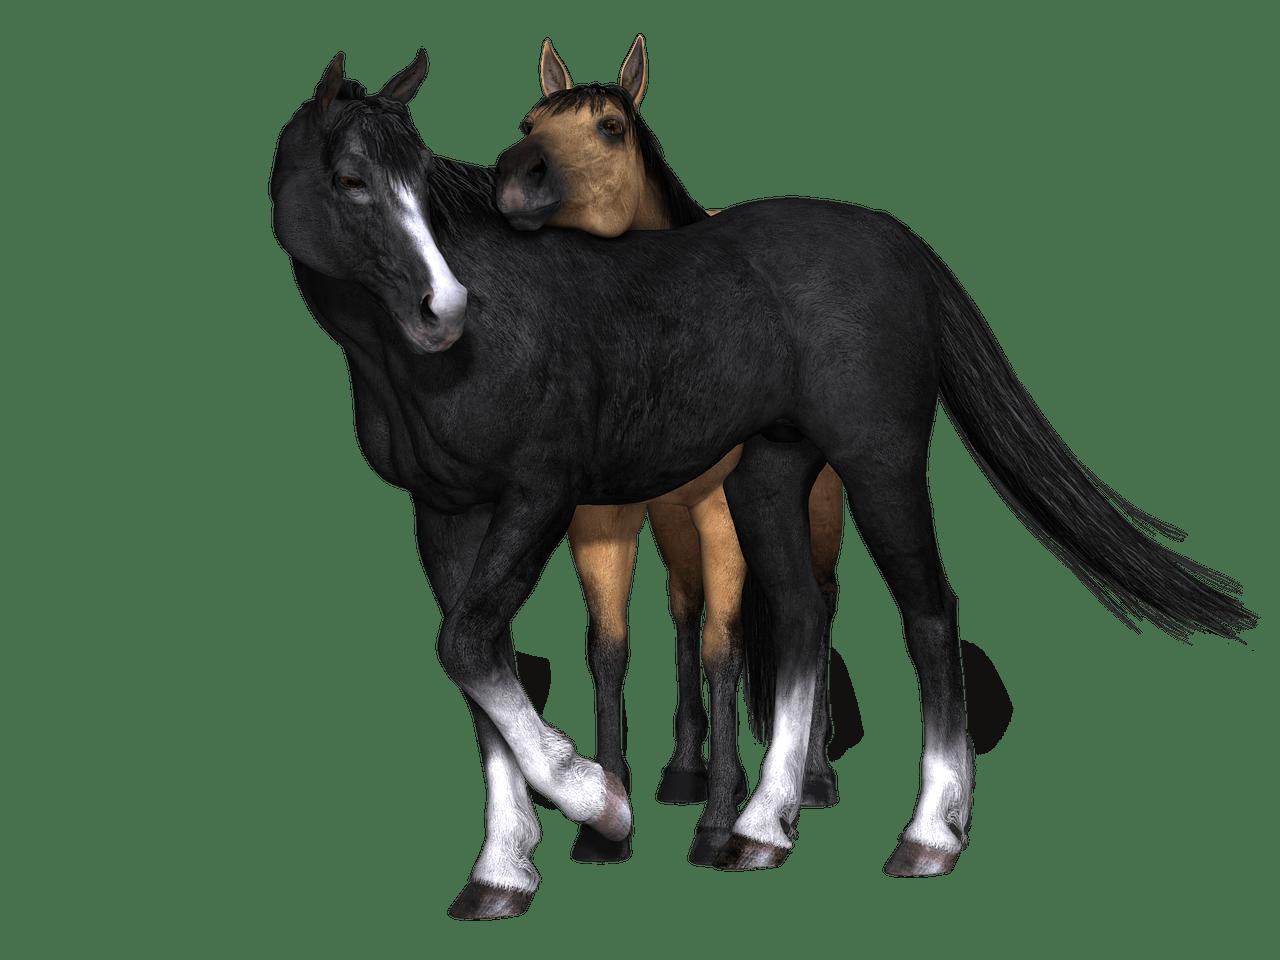 Horses Black Horse Looking Back Transparent Png Stickpng